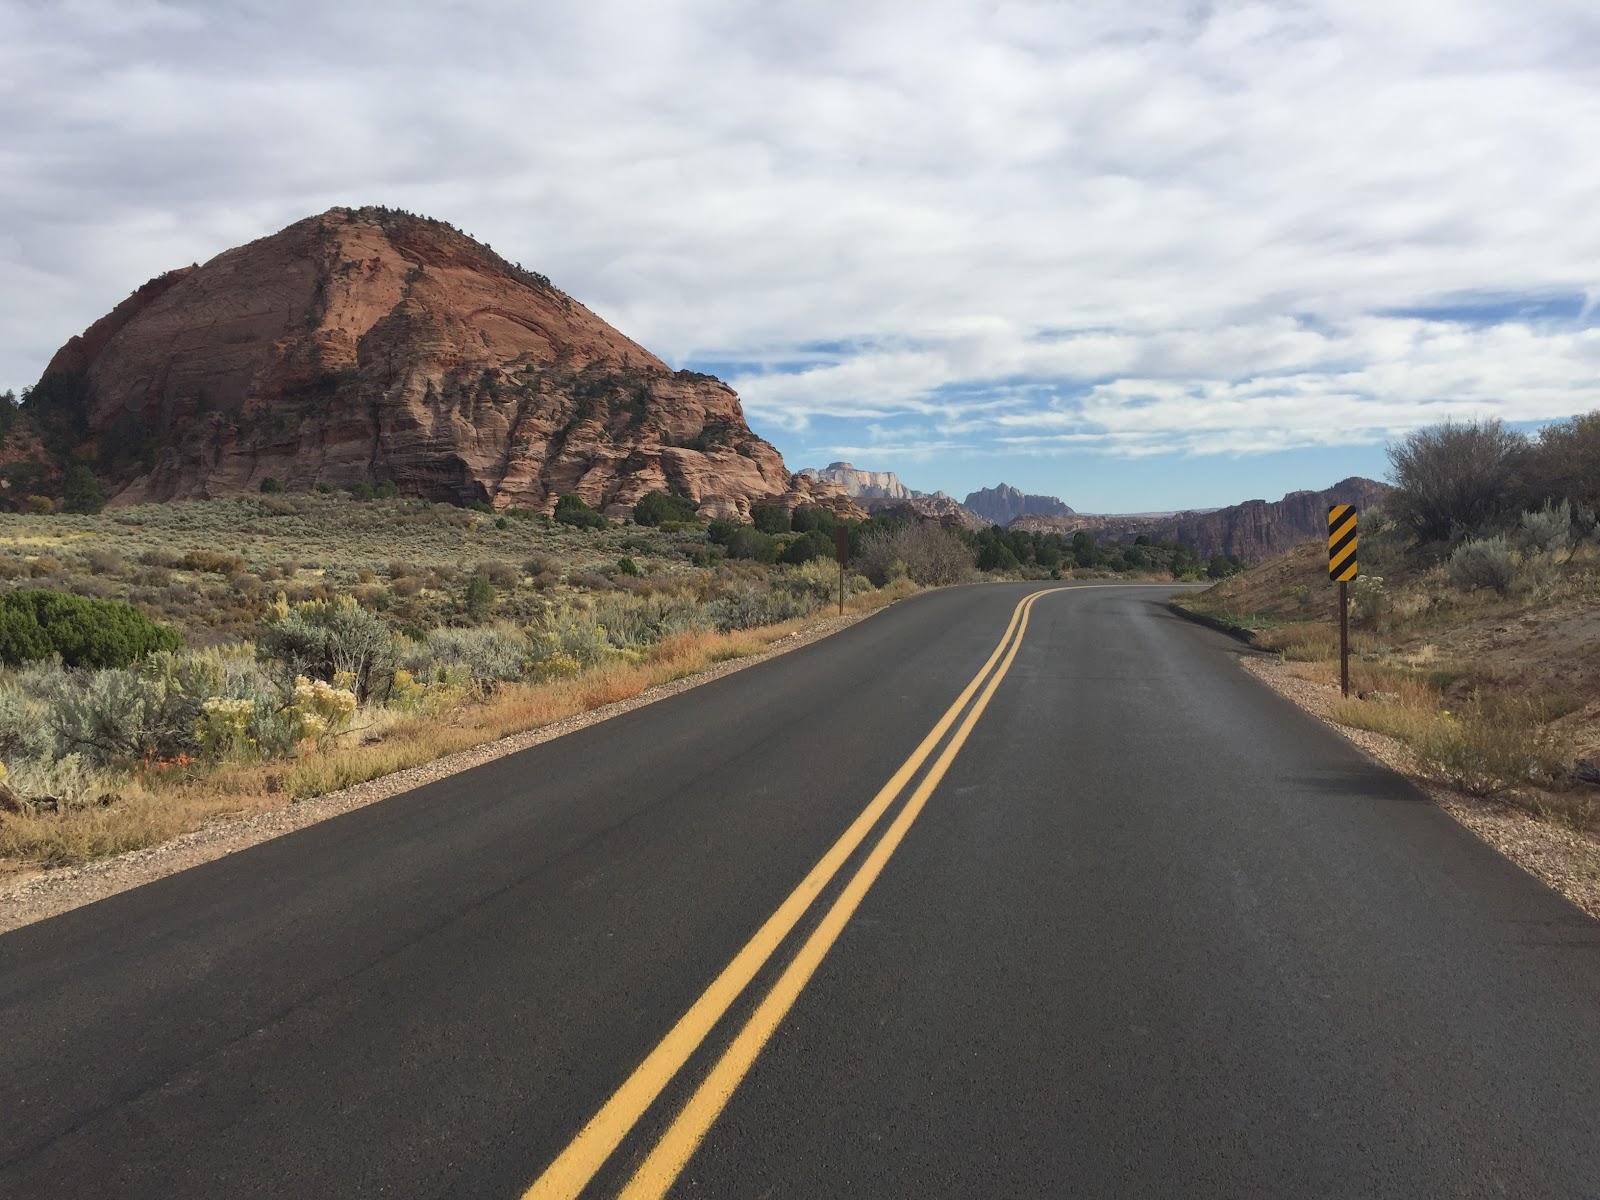 Riding Kolob Terrace by bike - Tabernacle Dome and roadway